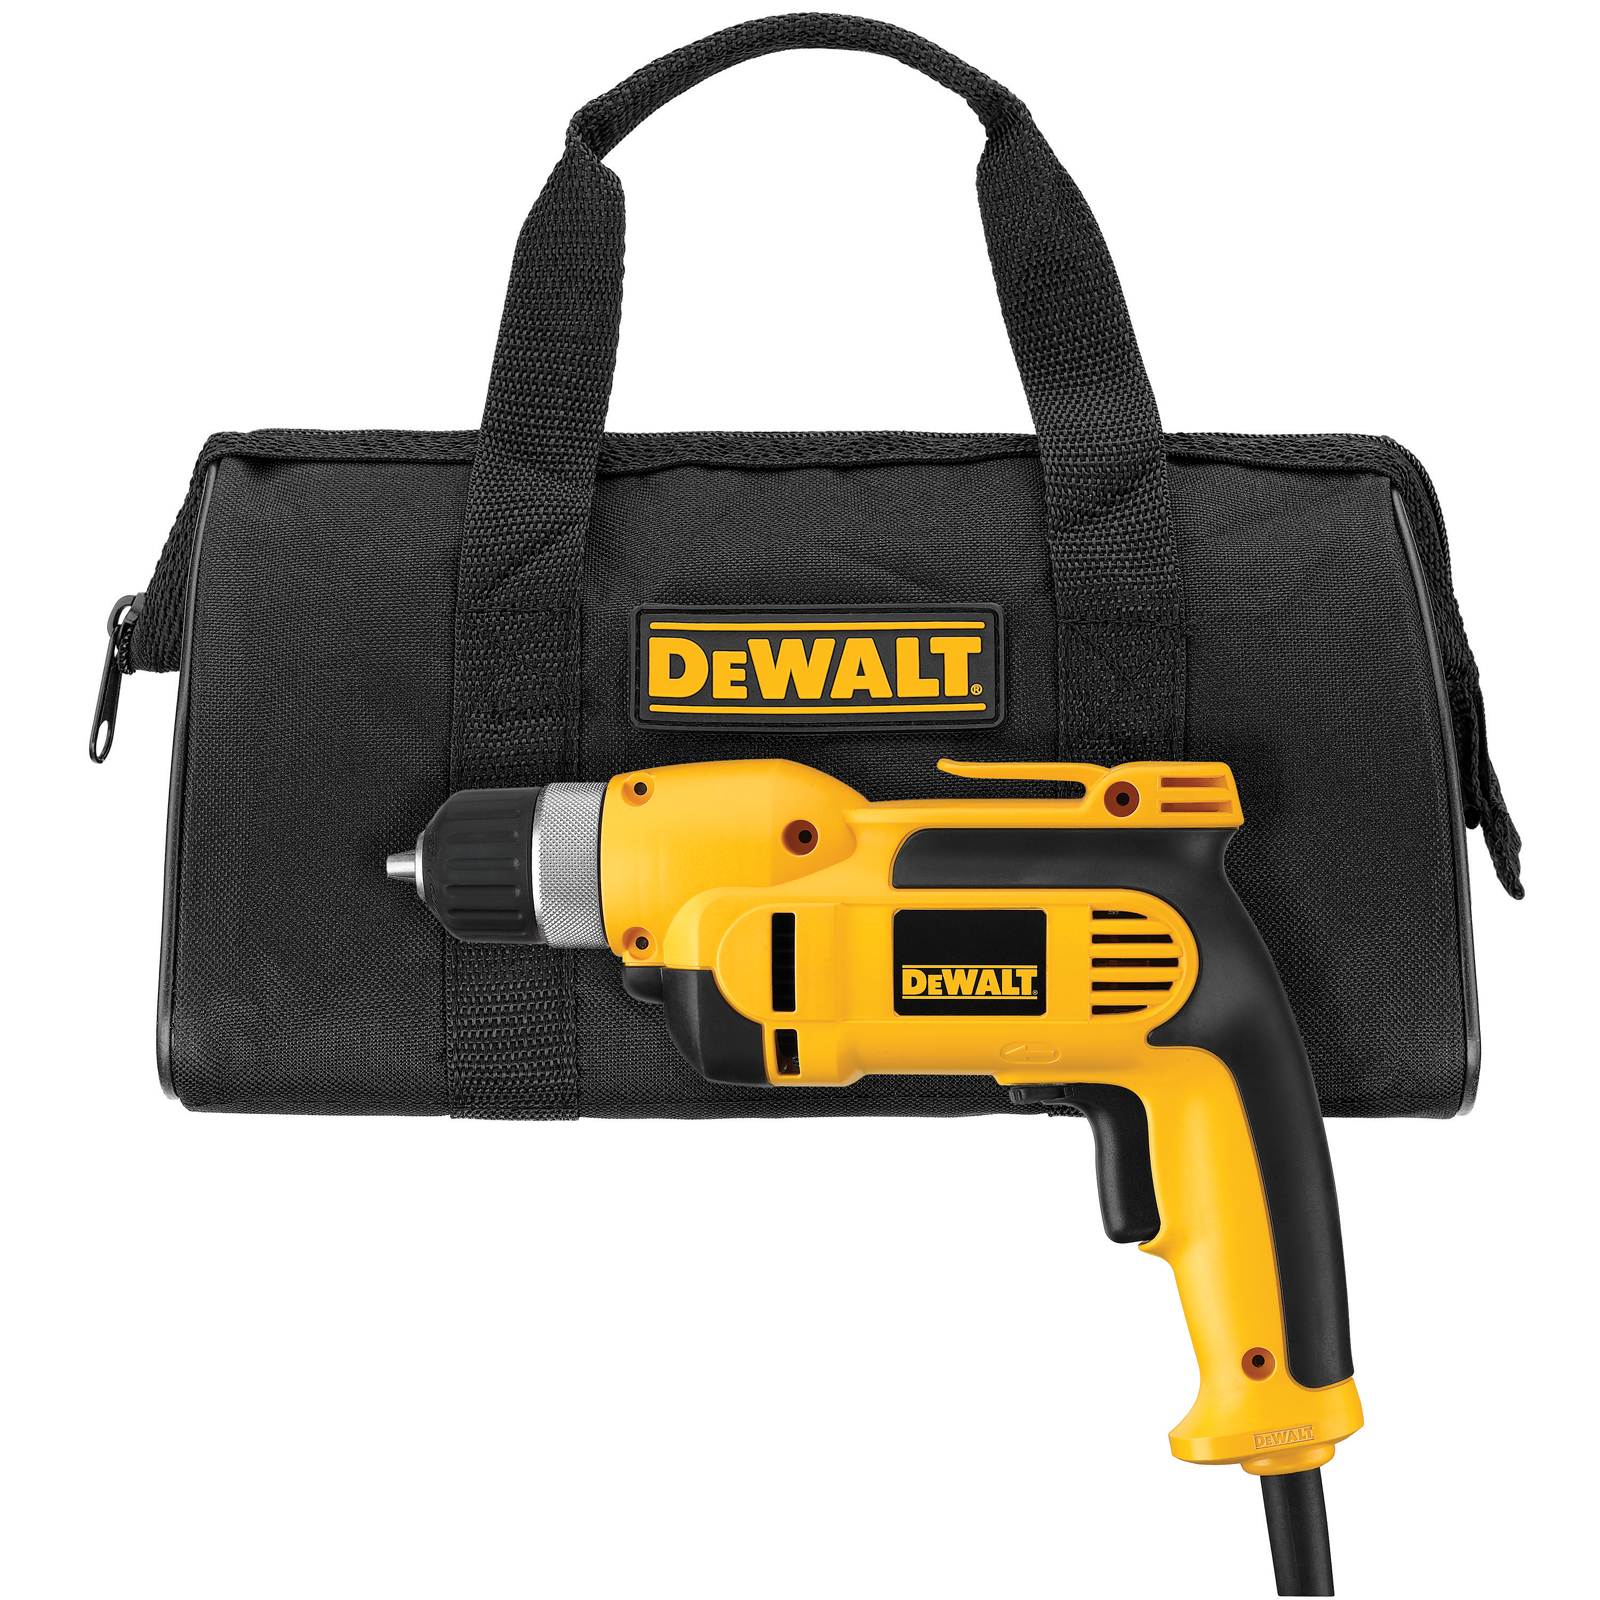 DeWalt 3/8 in. (10mm) VSR Pistol Grip Drill Kit with Keyless Chuck